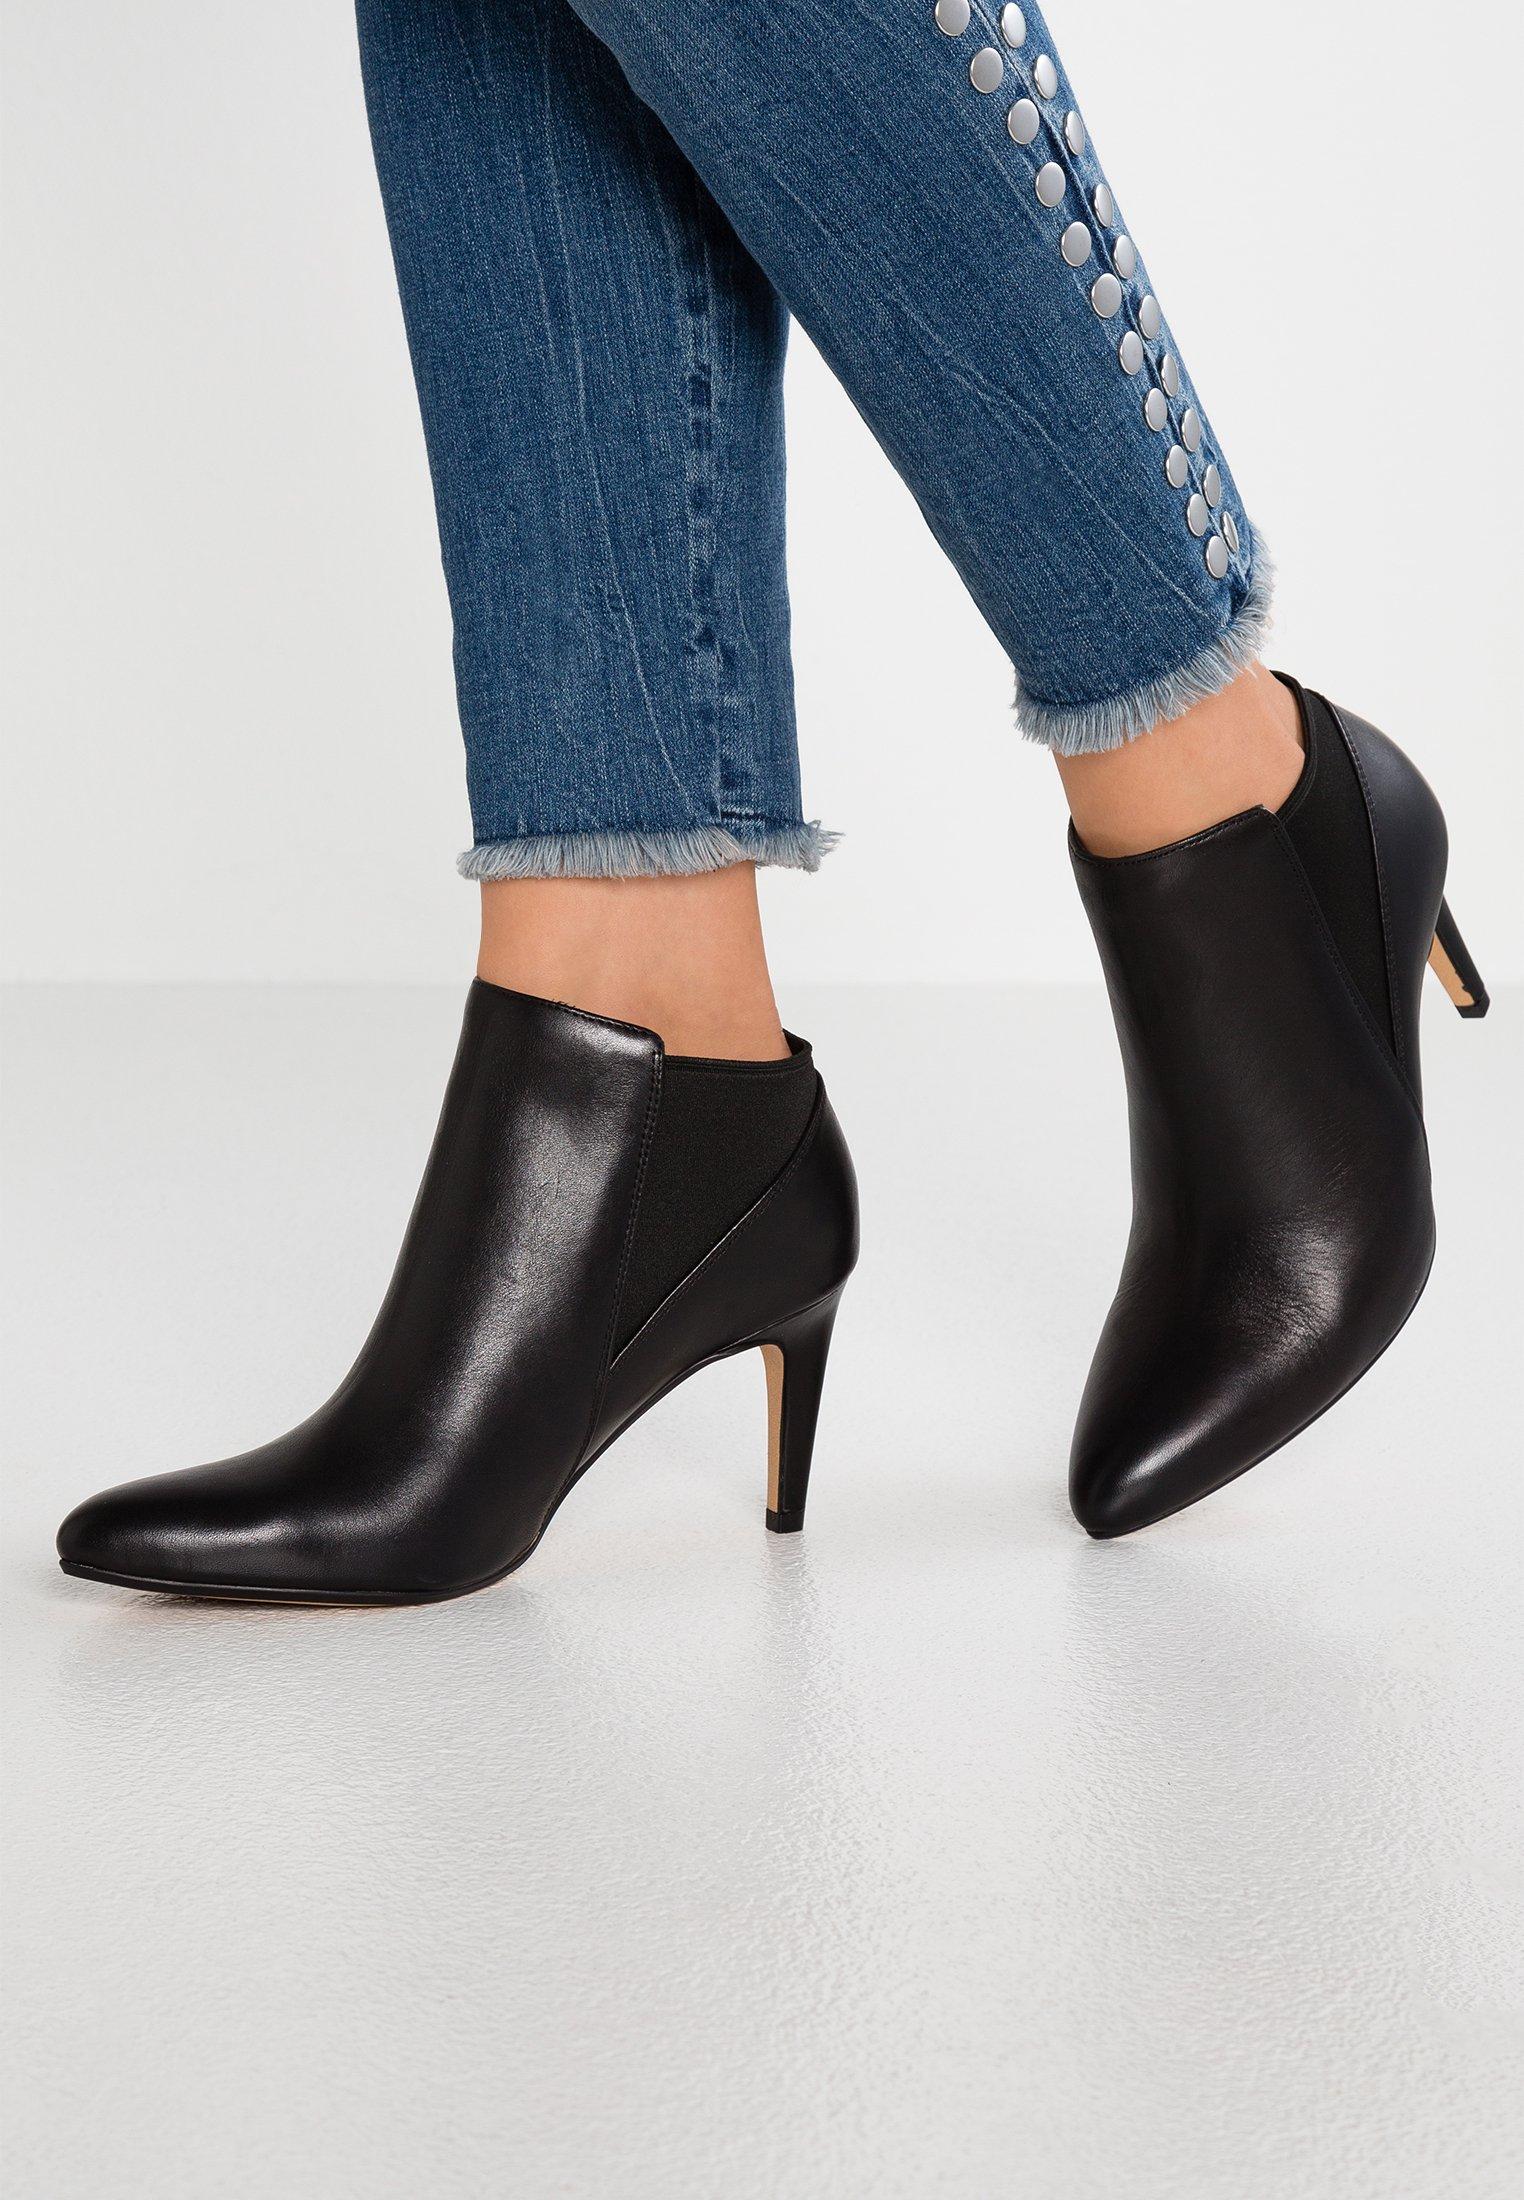 Clarks LAINA VIOLET - Ankle Boot - black   Damen Schuhe 2020